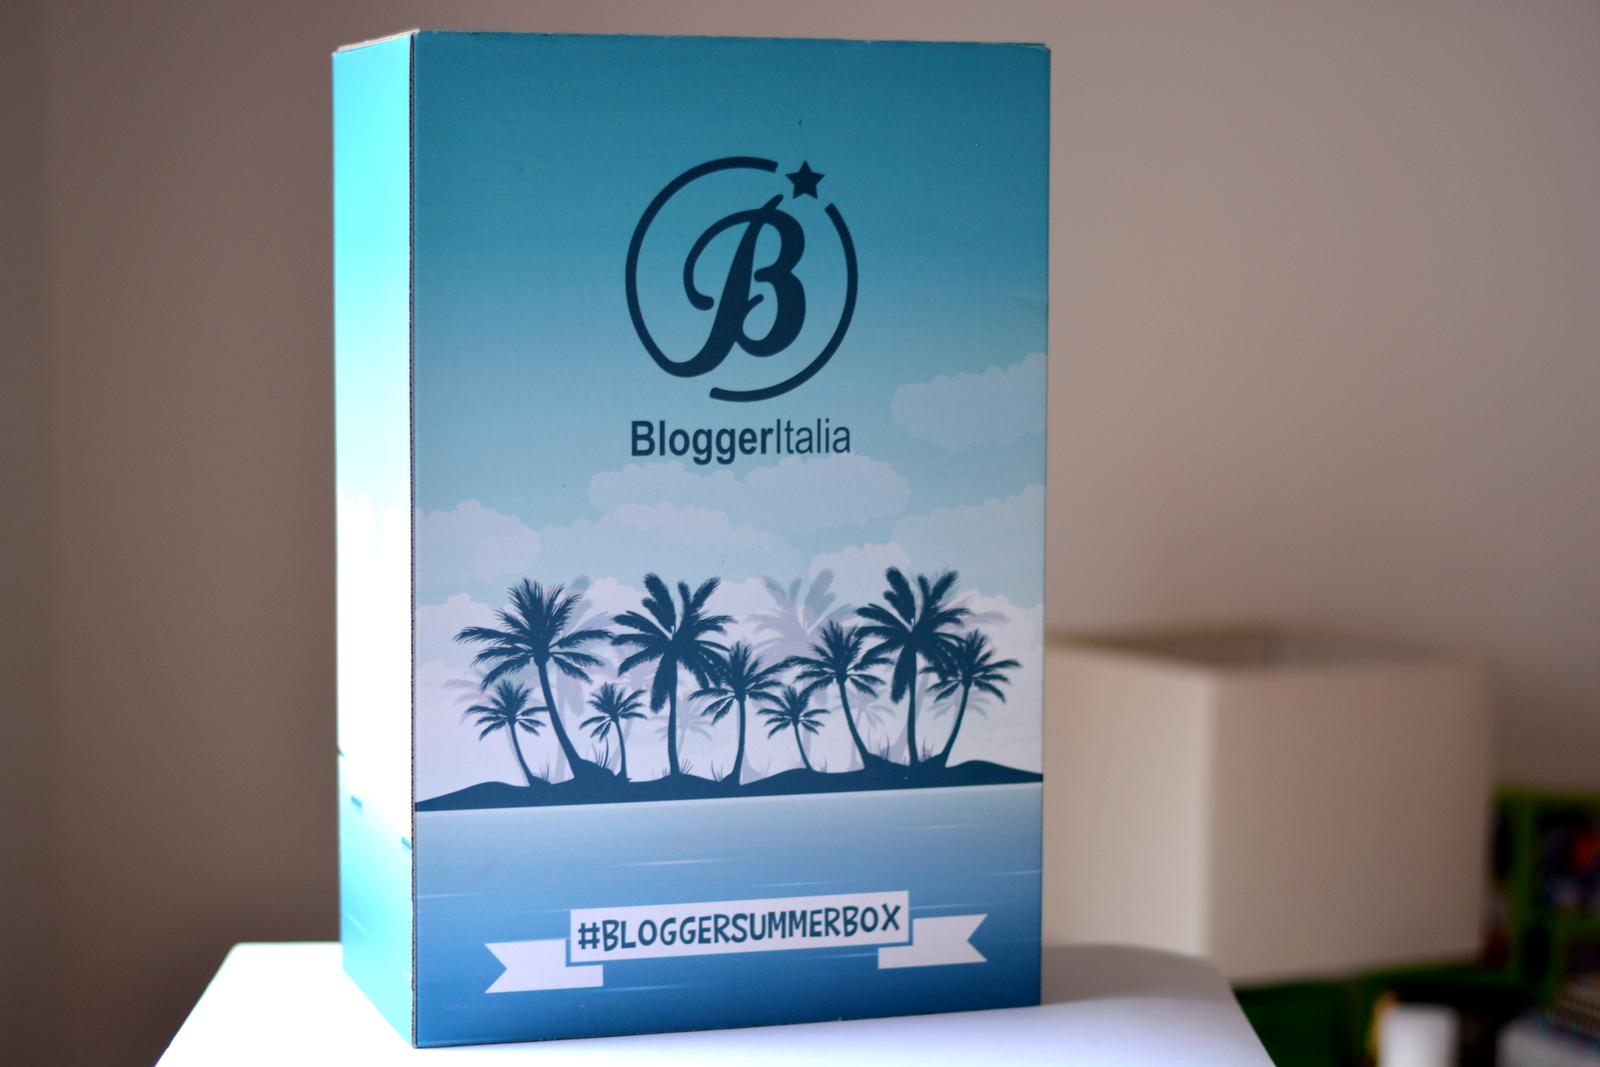 #BloggerSummerBox